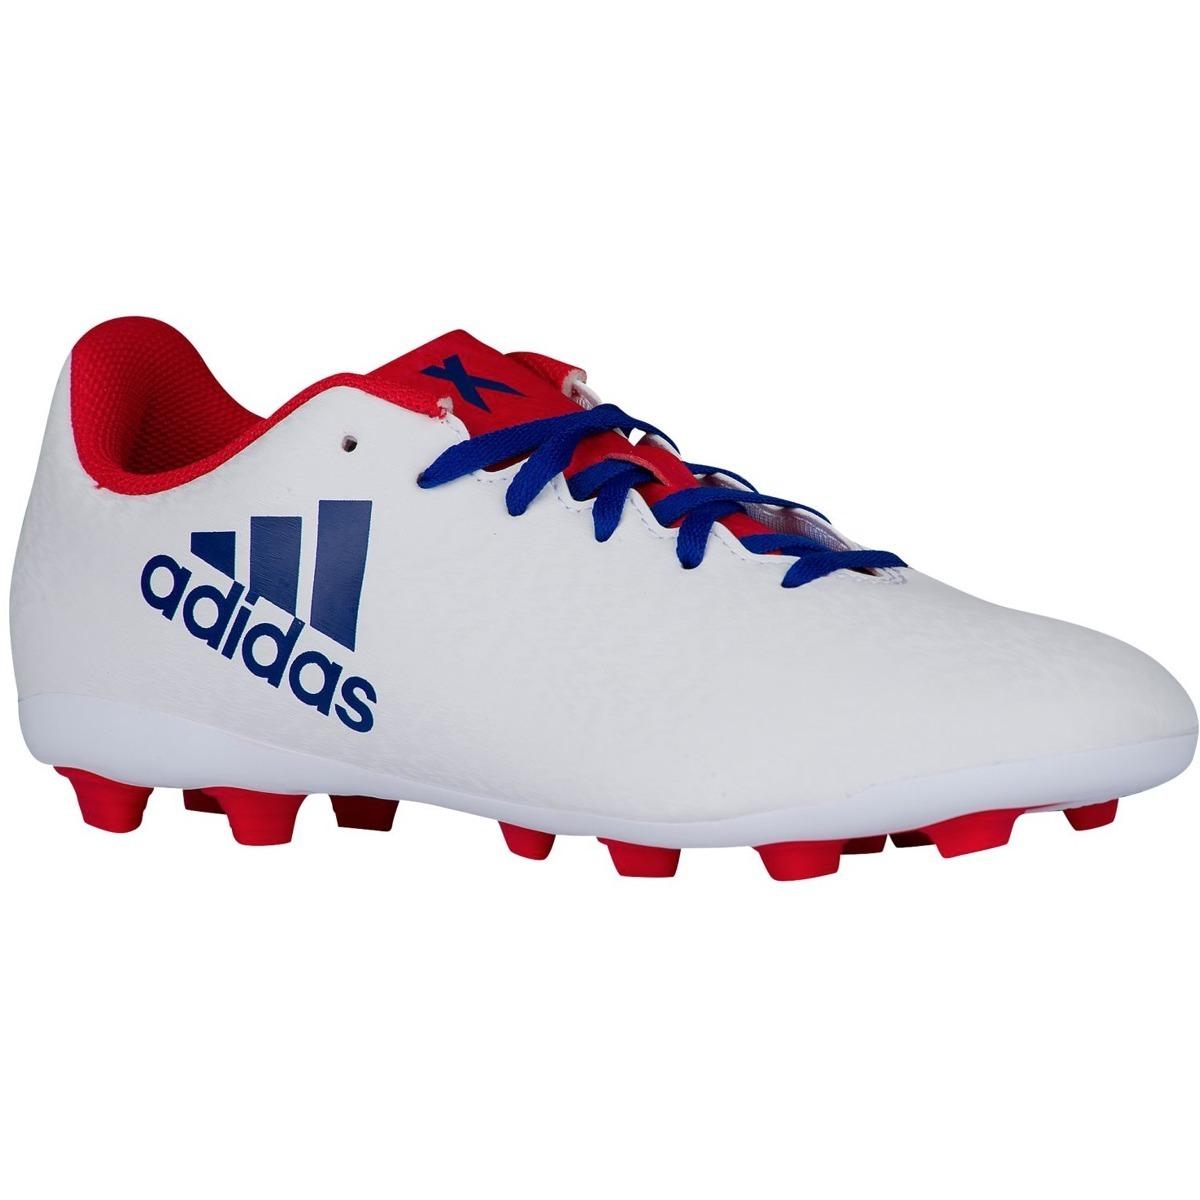 ... zapato futbol con tachones adidas x 16.4 woman fg - zapatera. Cargando  zoom. detailing ... 2b1fcf4fb8353